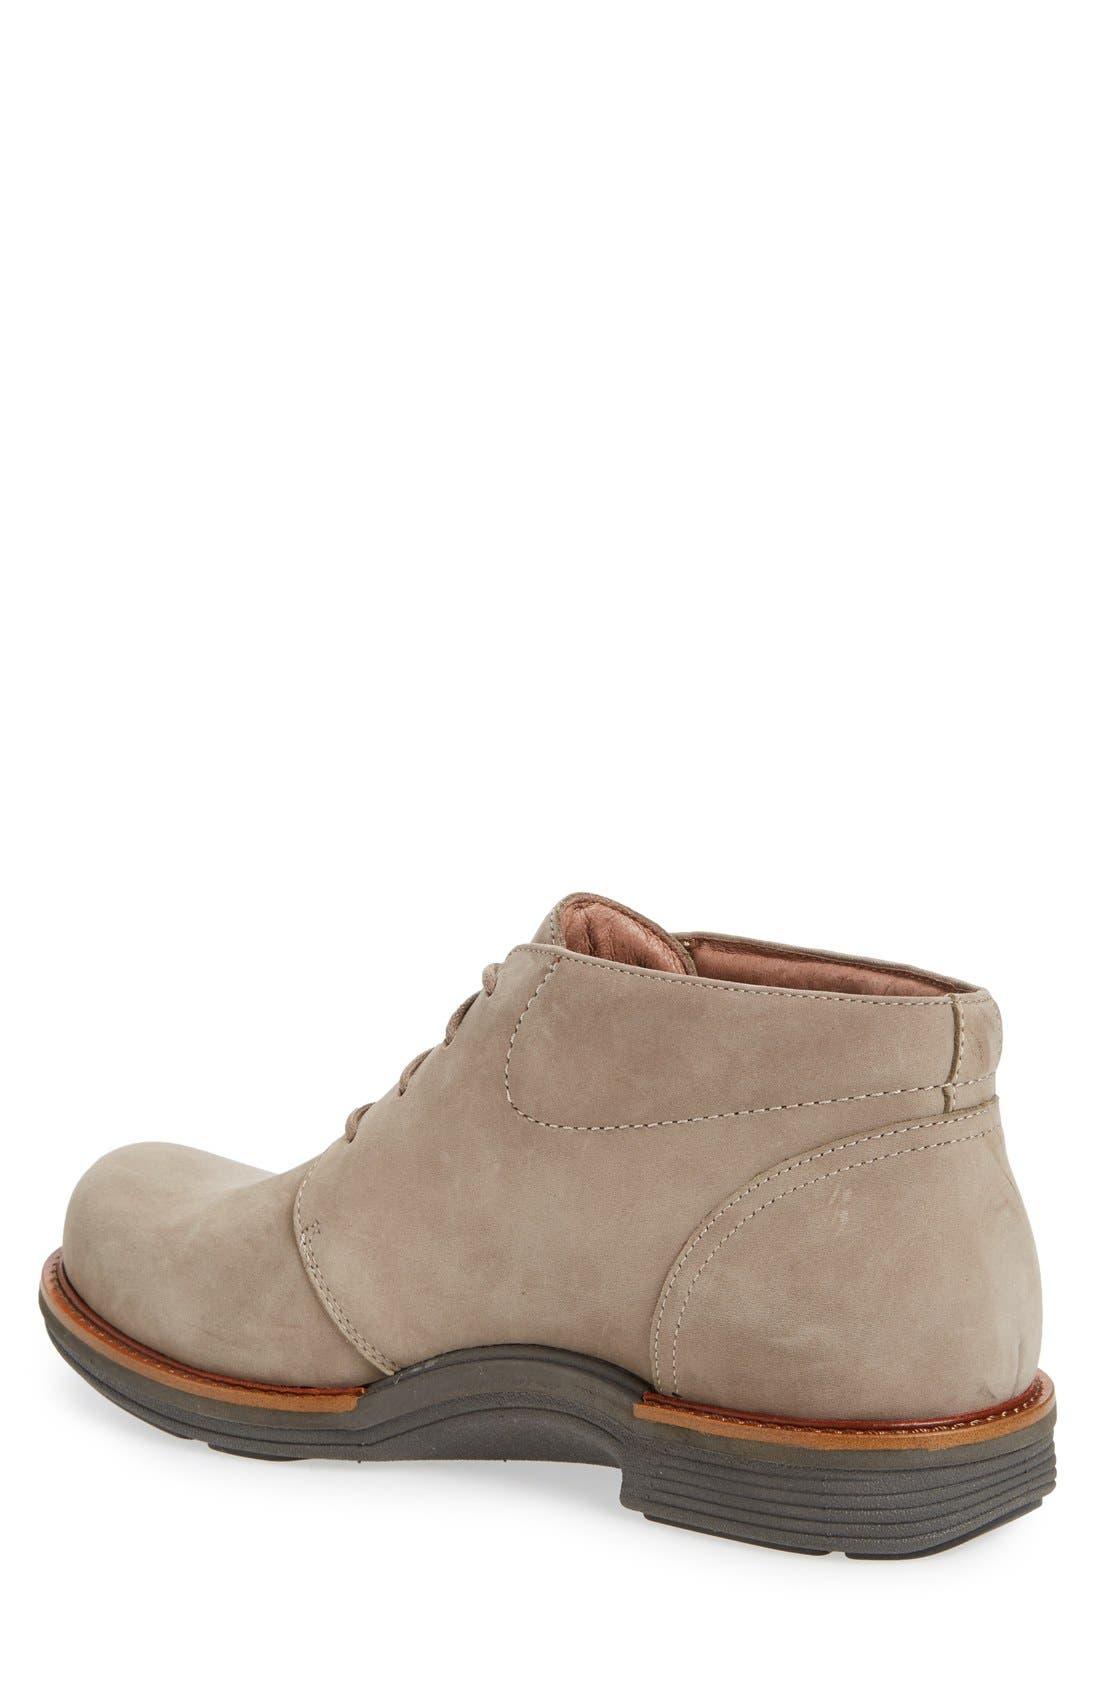 'Jake' Chukka Boot,                             Alternate thumbnail 2, color,                             Taupe Milled Nubuck Leather